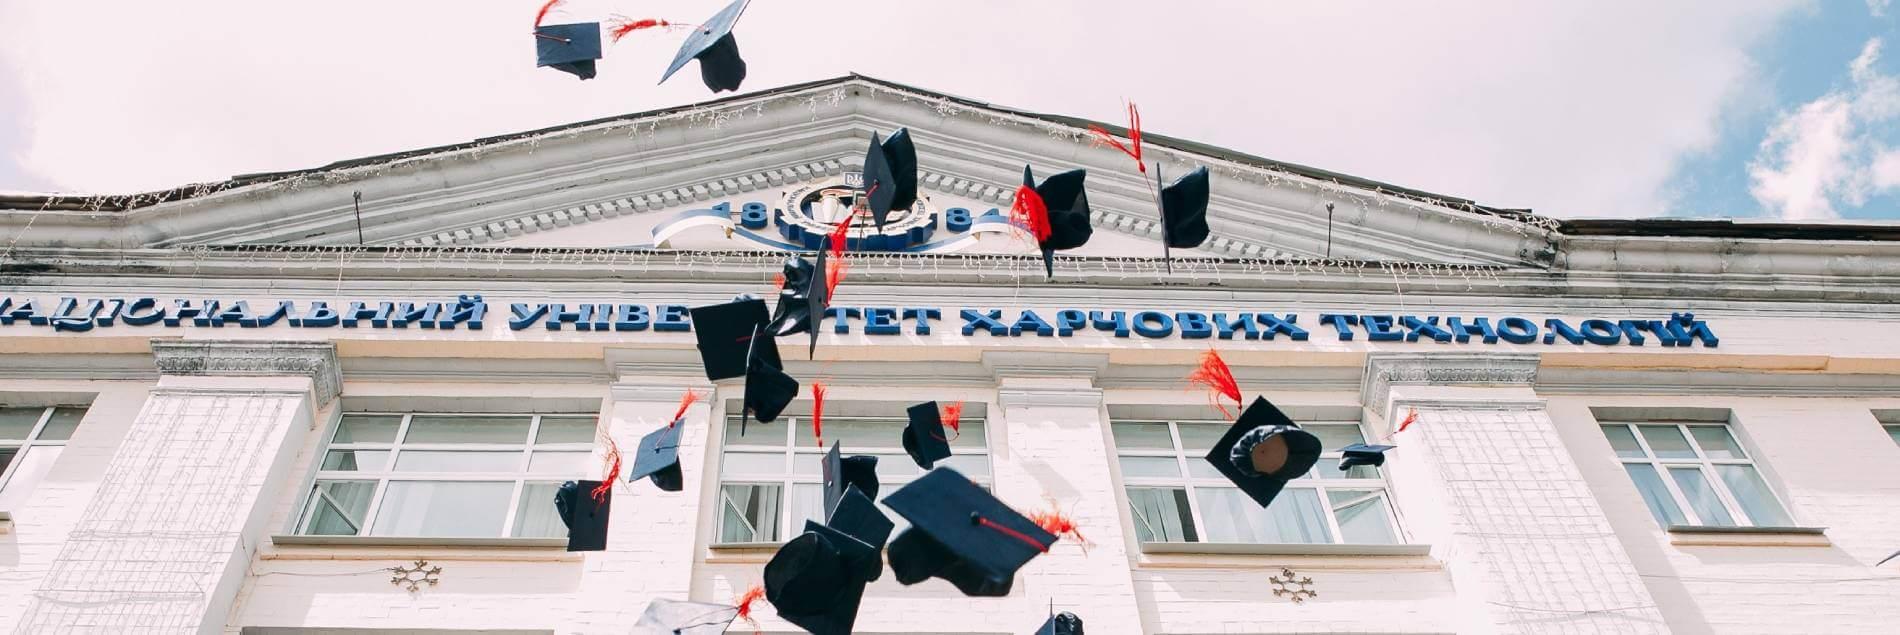 graduates throwing caps banner - vasily-koloda-620886-unsplash-1